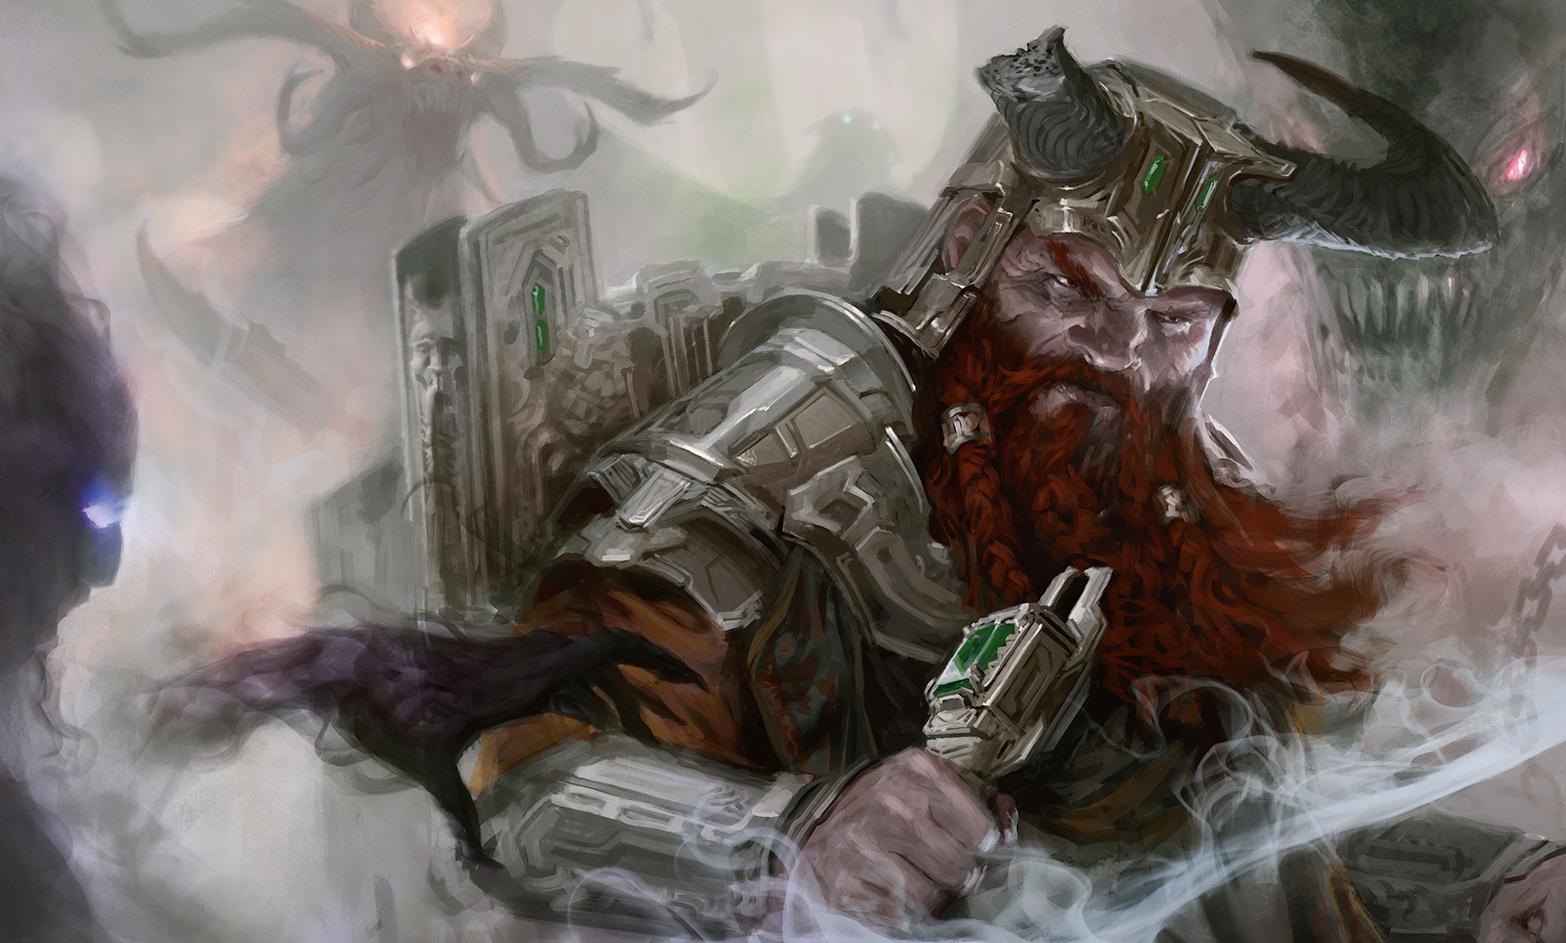 [Gods of Wandrossa] Revamped God Ranks, Alignments, and Powers